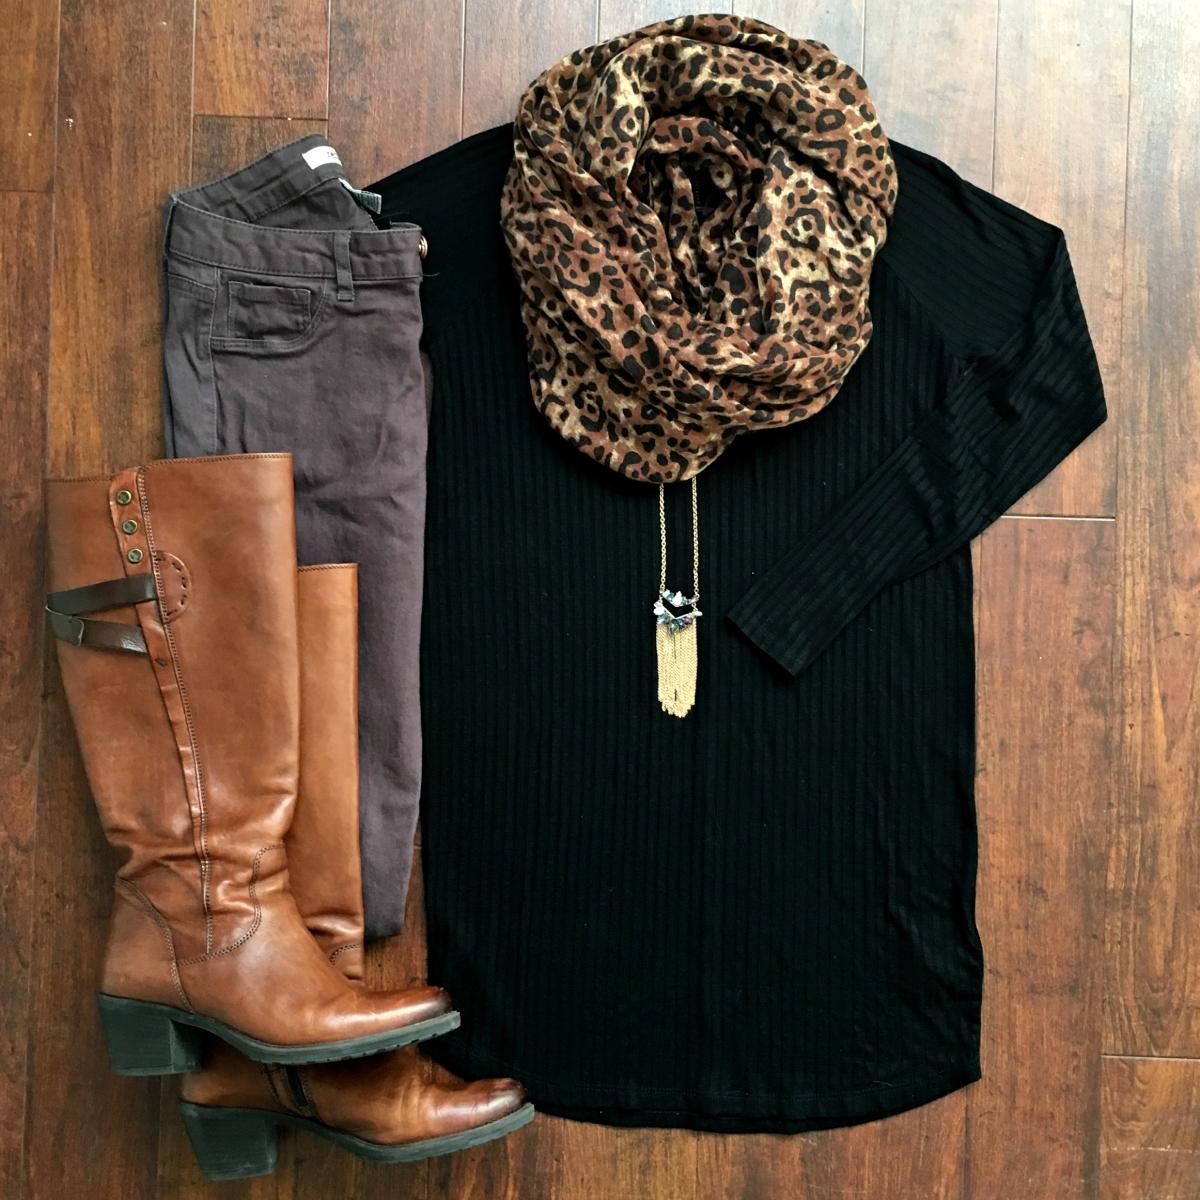 Mauve pants and a leopard scarf